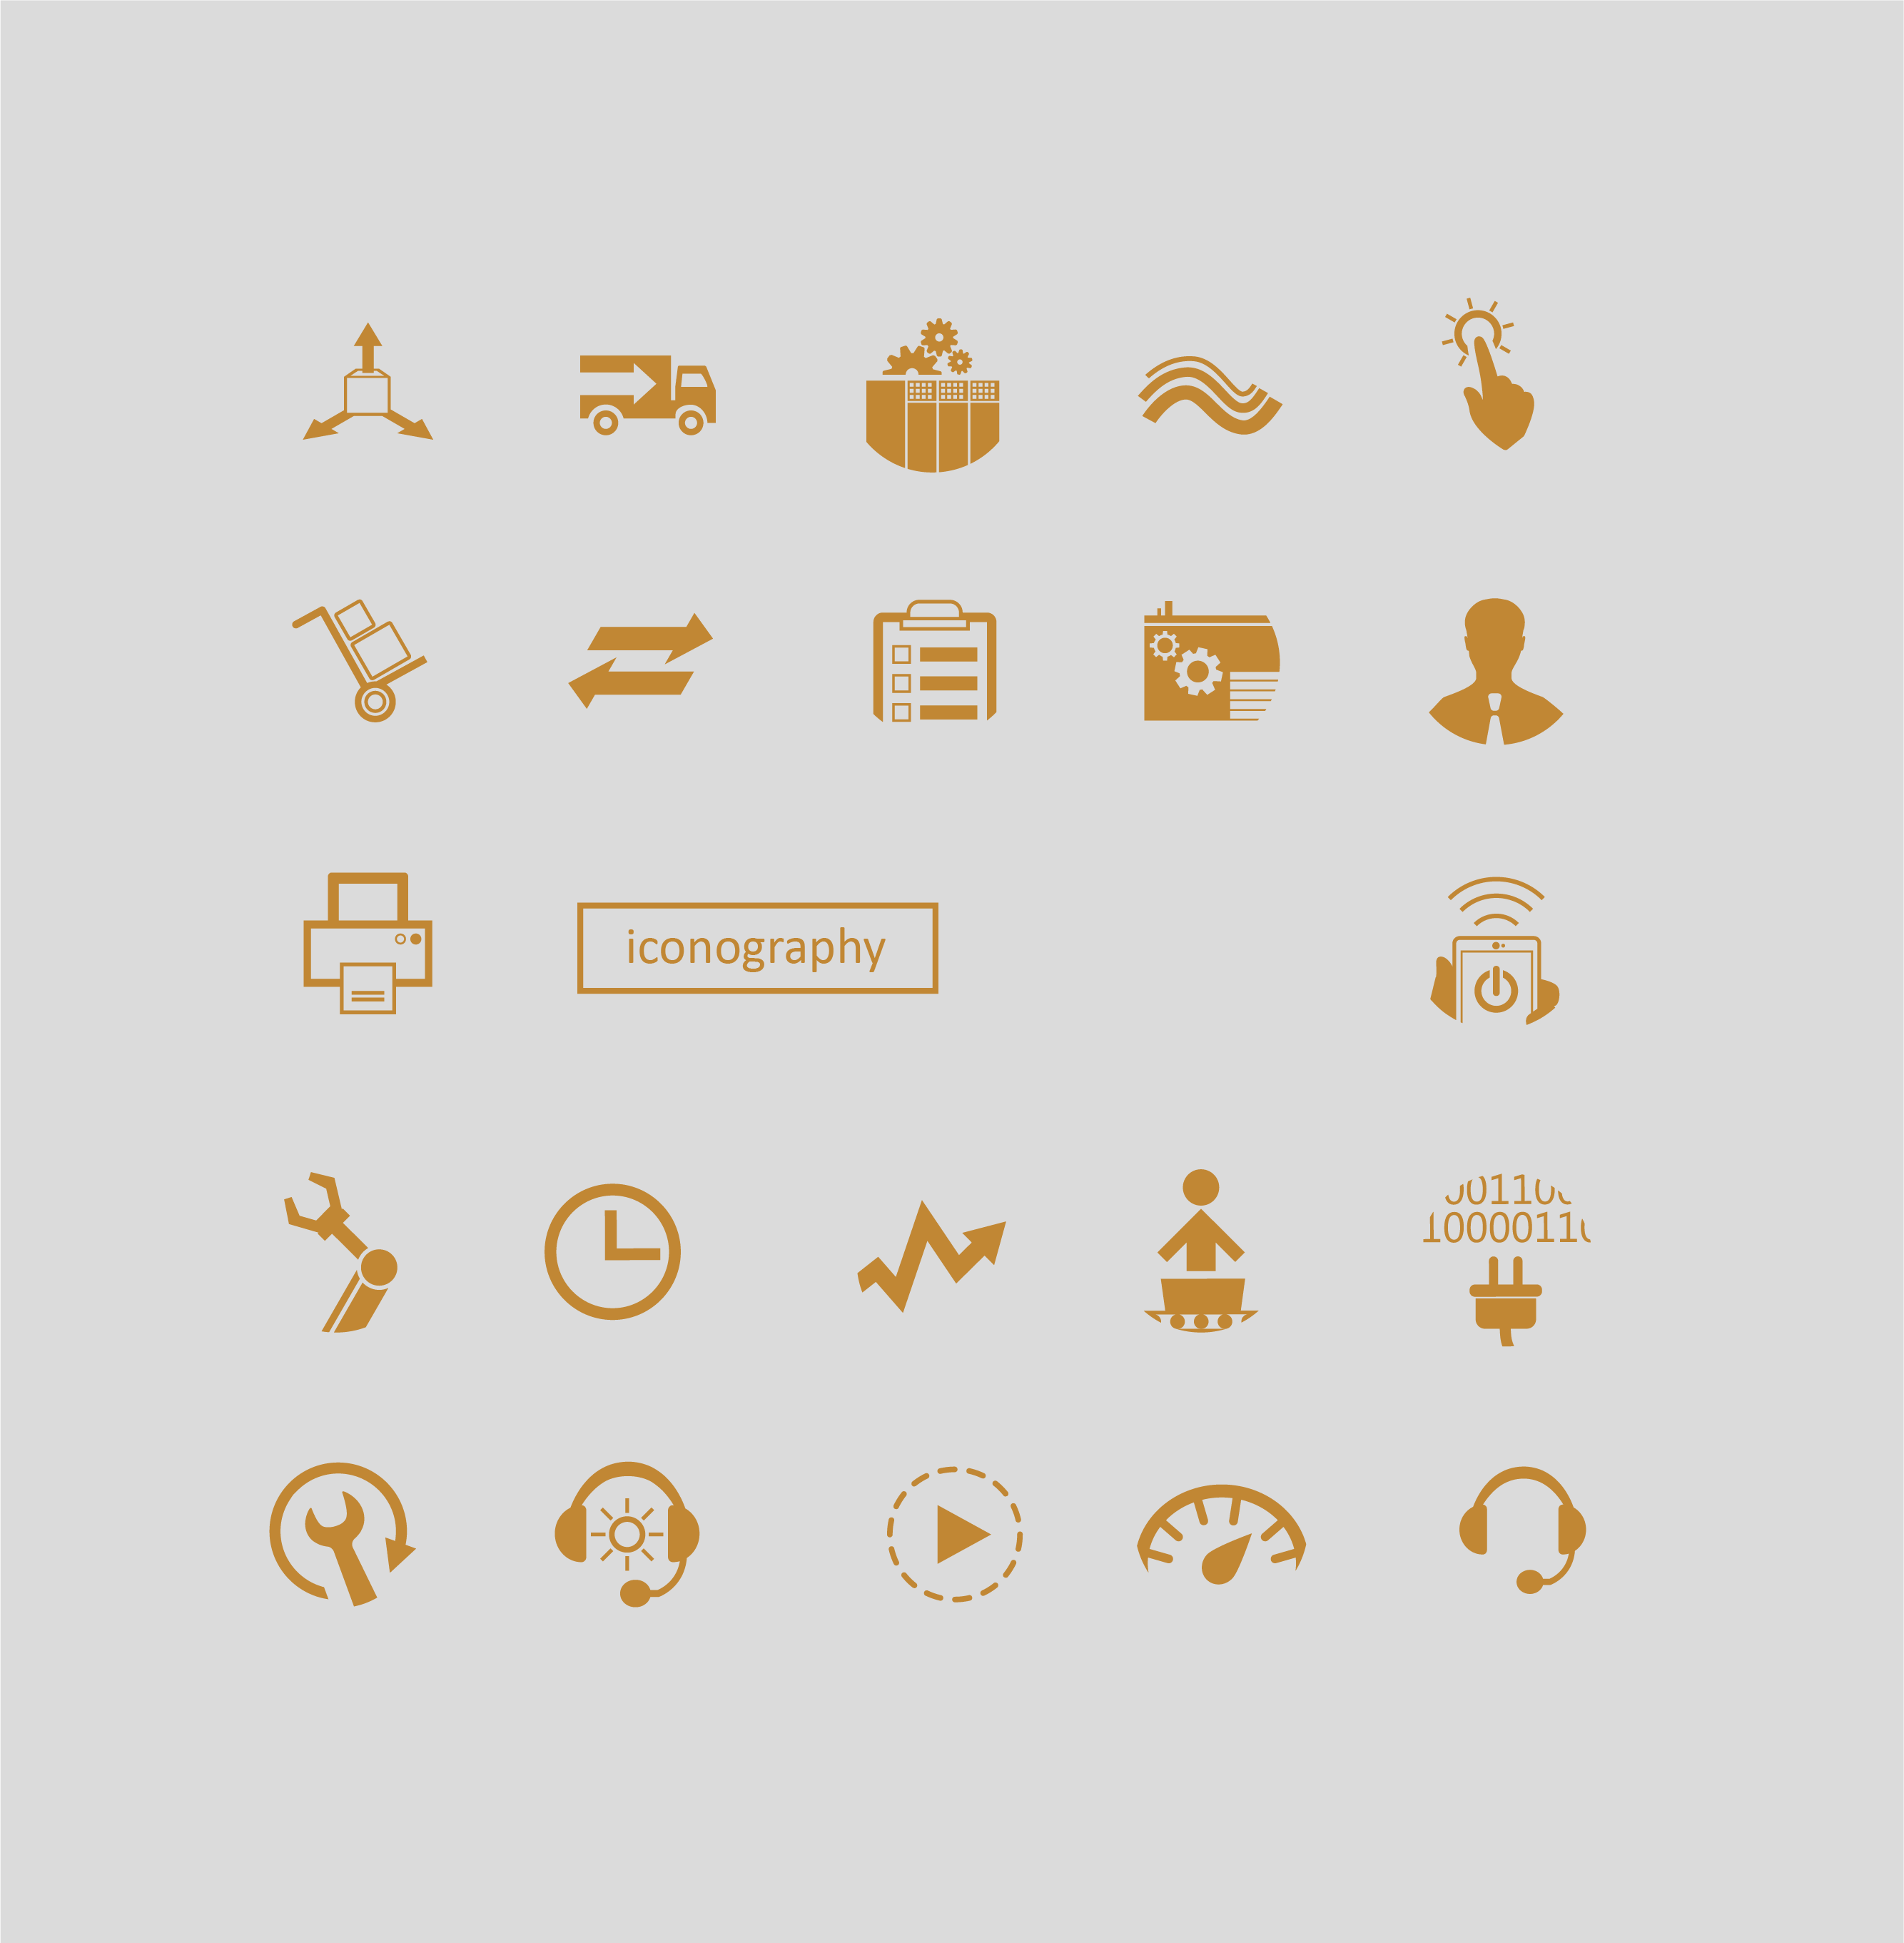 Graphic Illustrations: Iconography